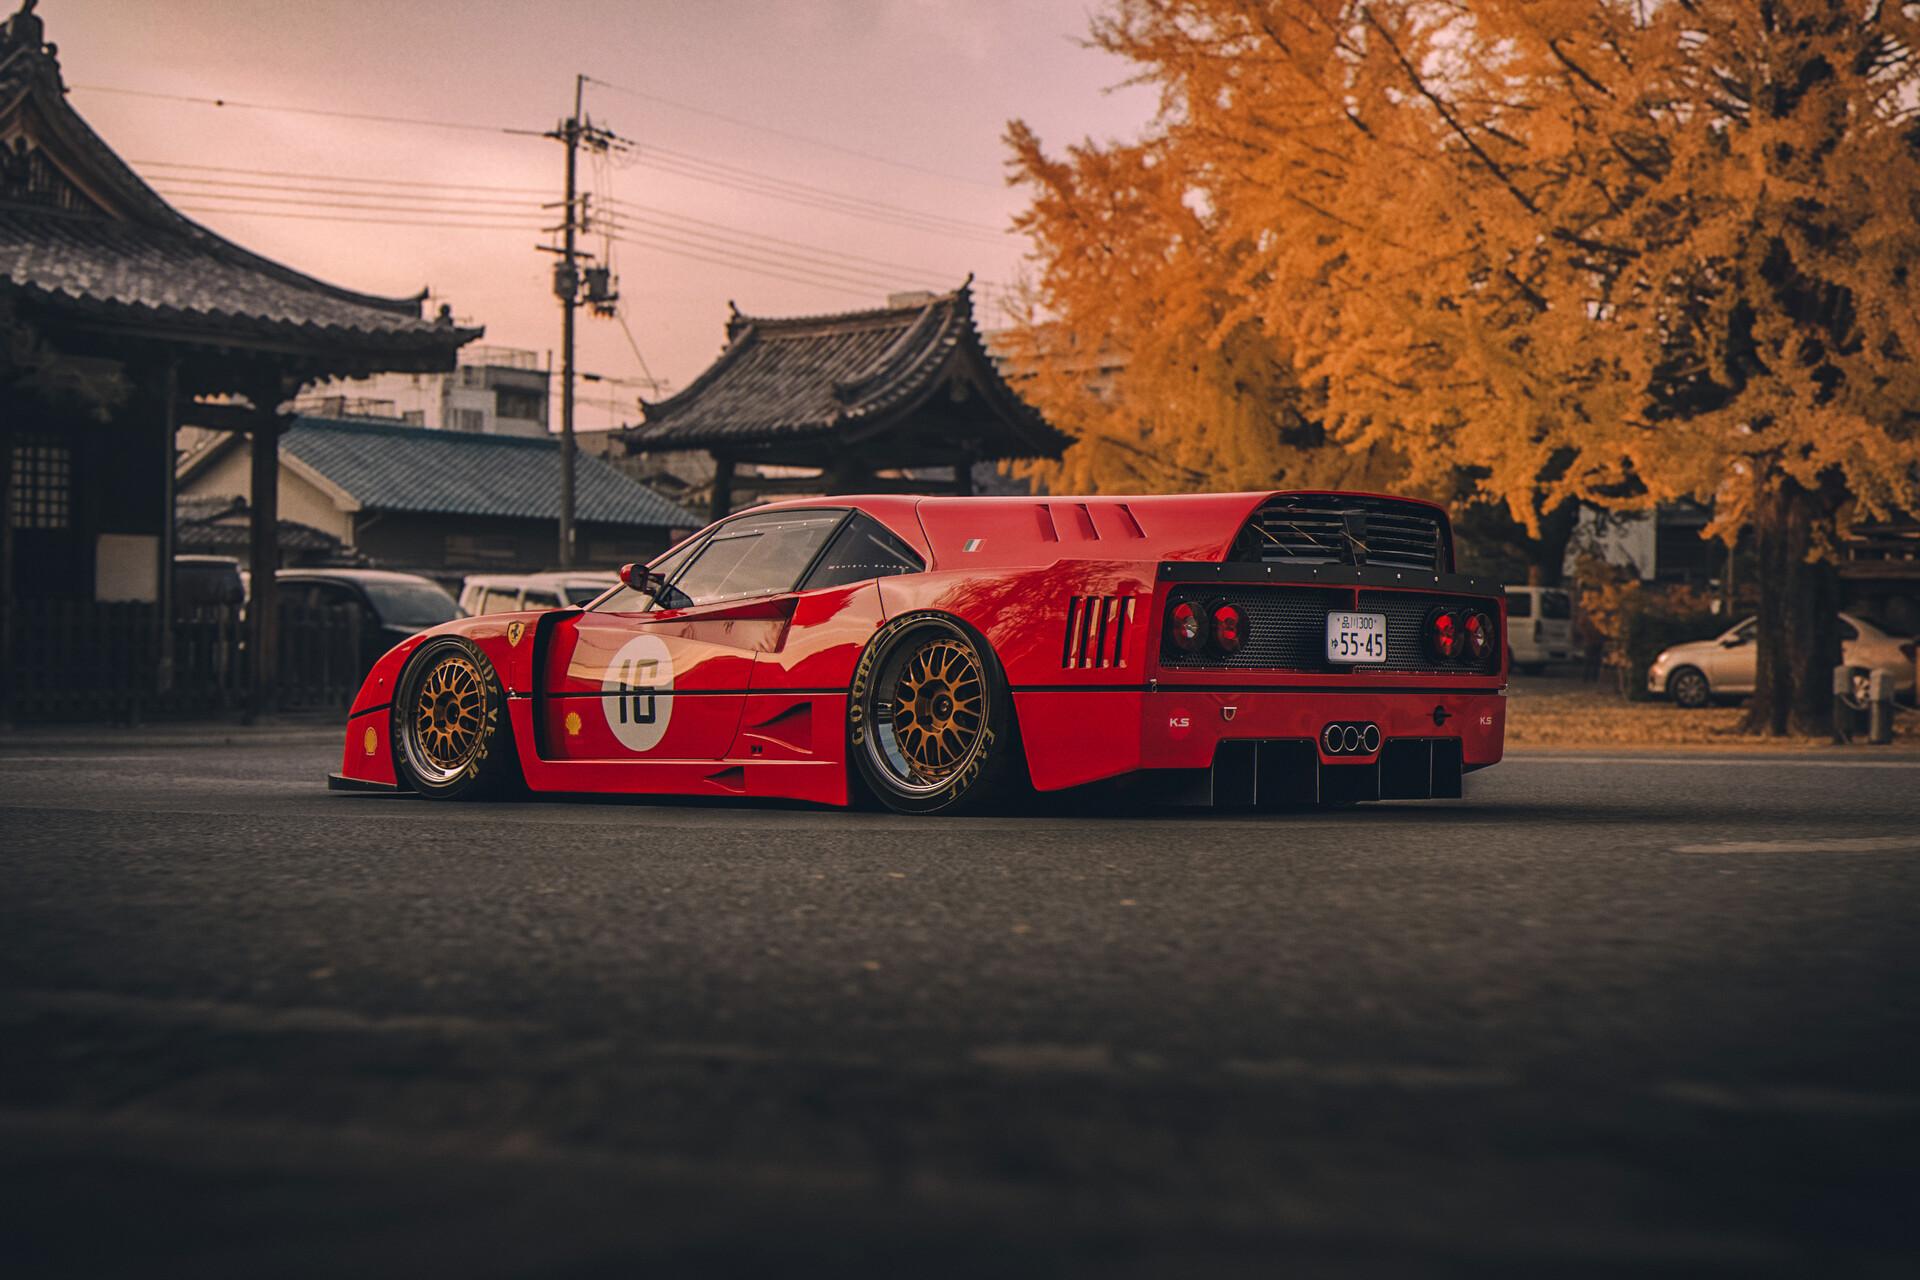 Wallpaper  Ferrari F40, Japan, red 1920x1280 , Elizium